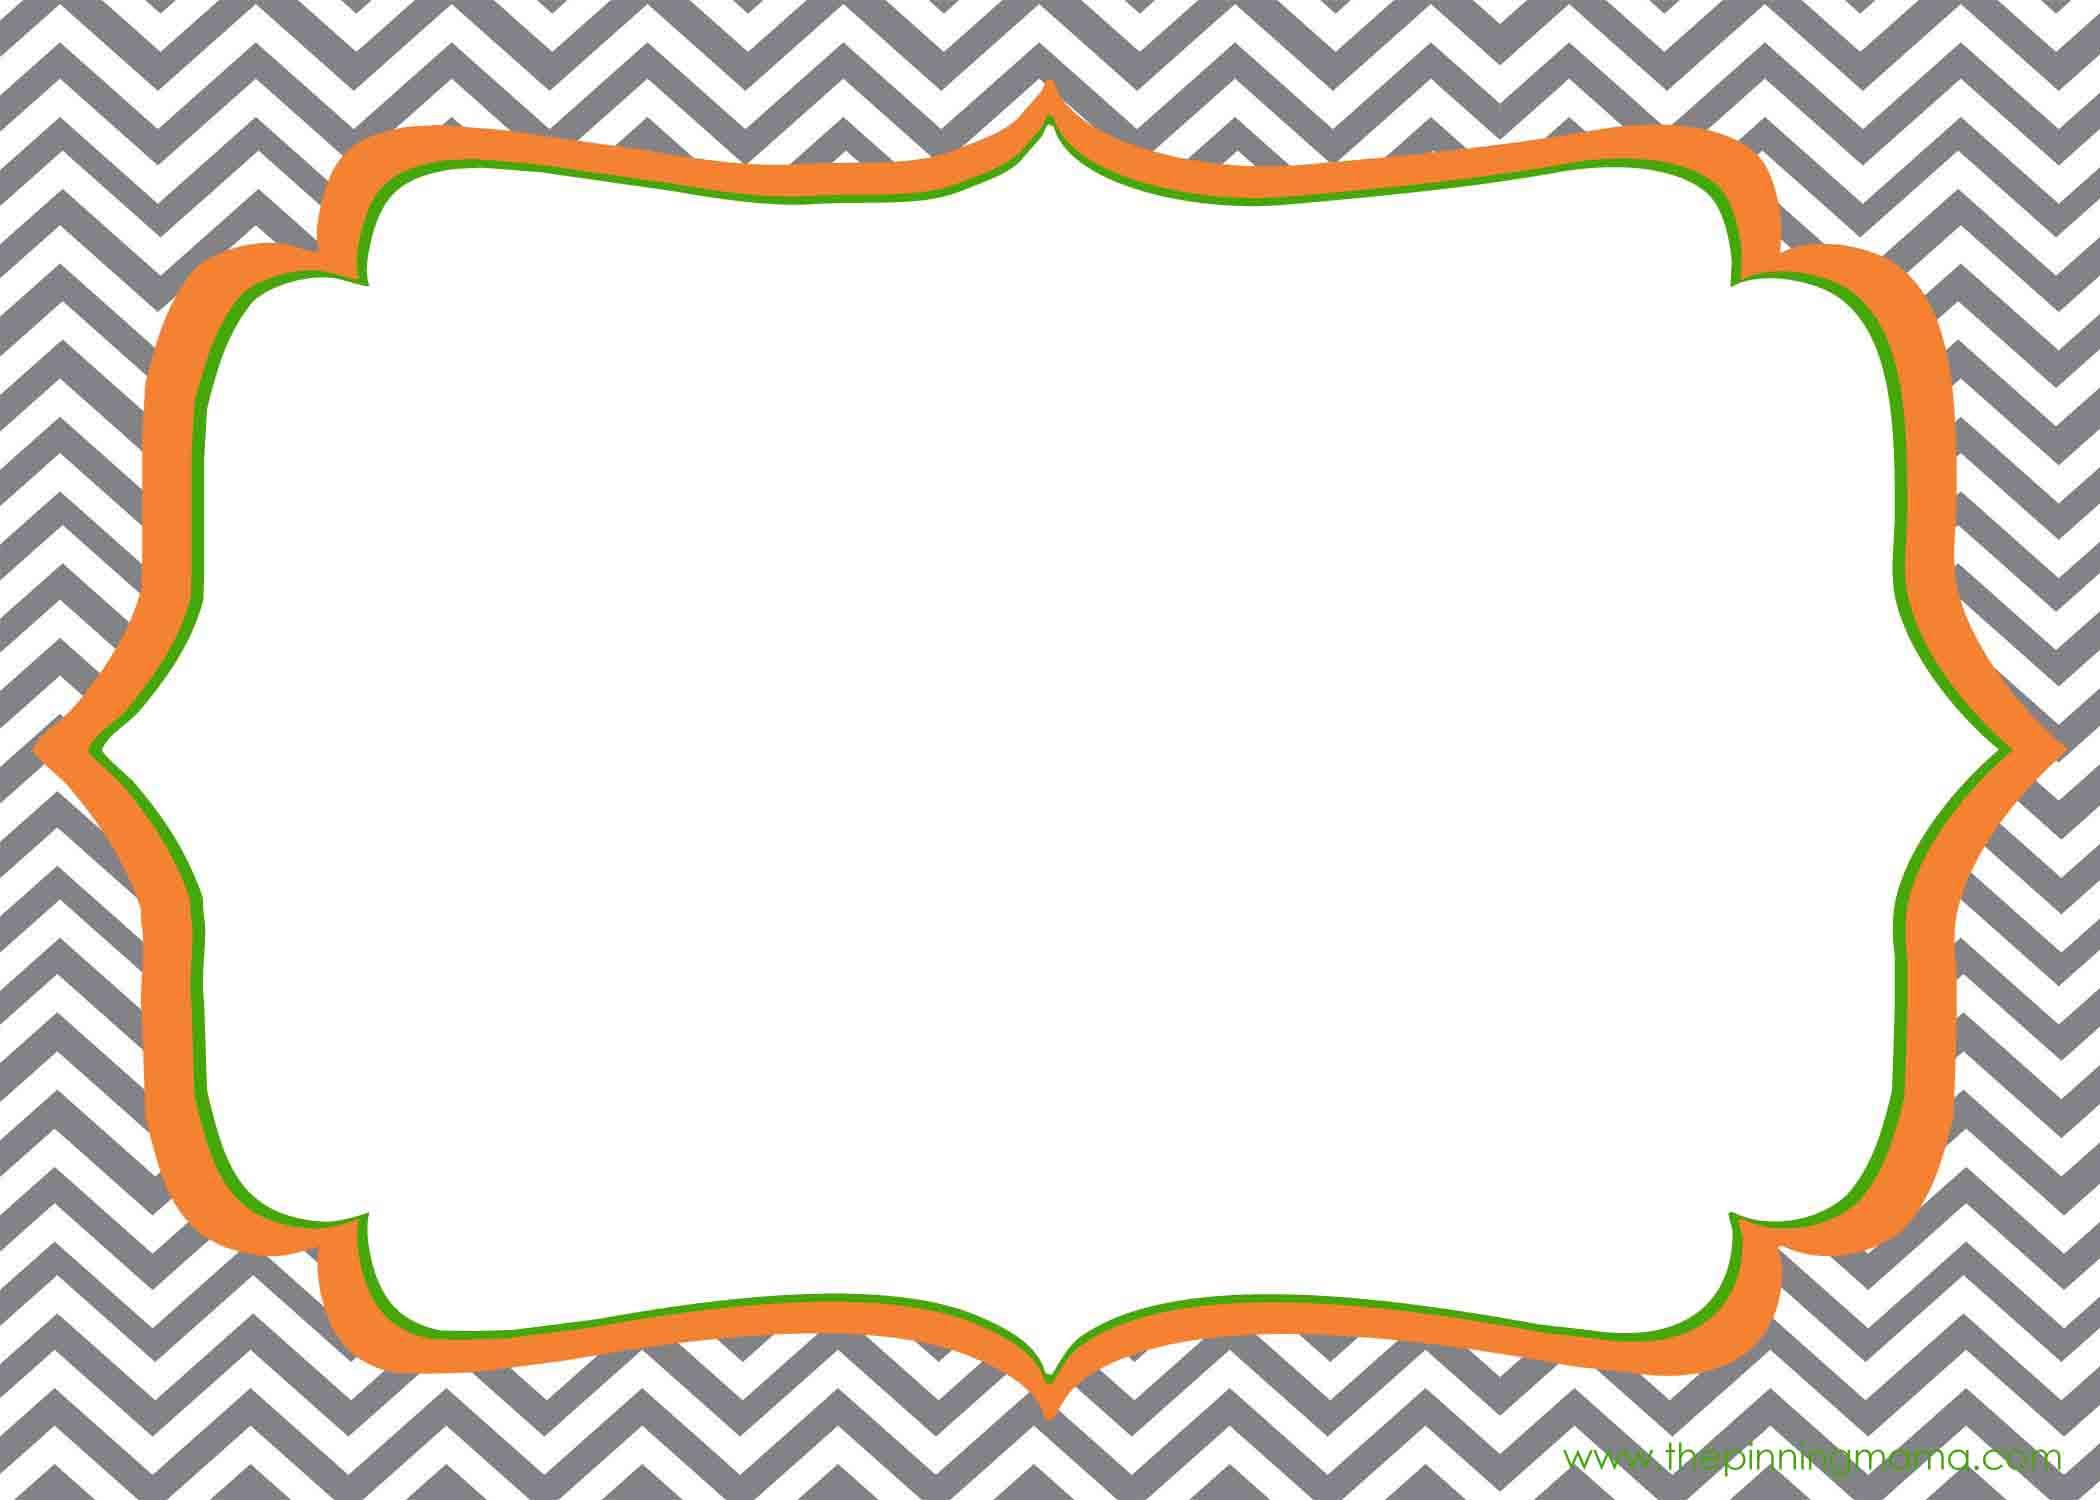 Blank Printable Invitation Cards - 2017 Invitation Cards